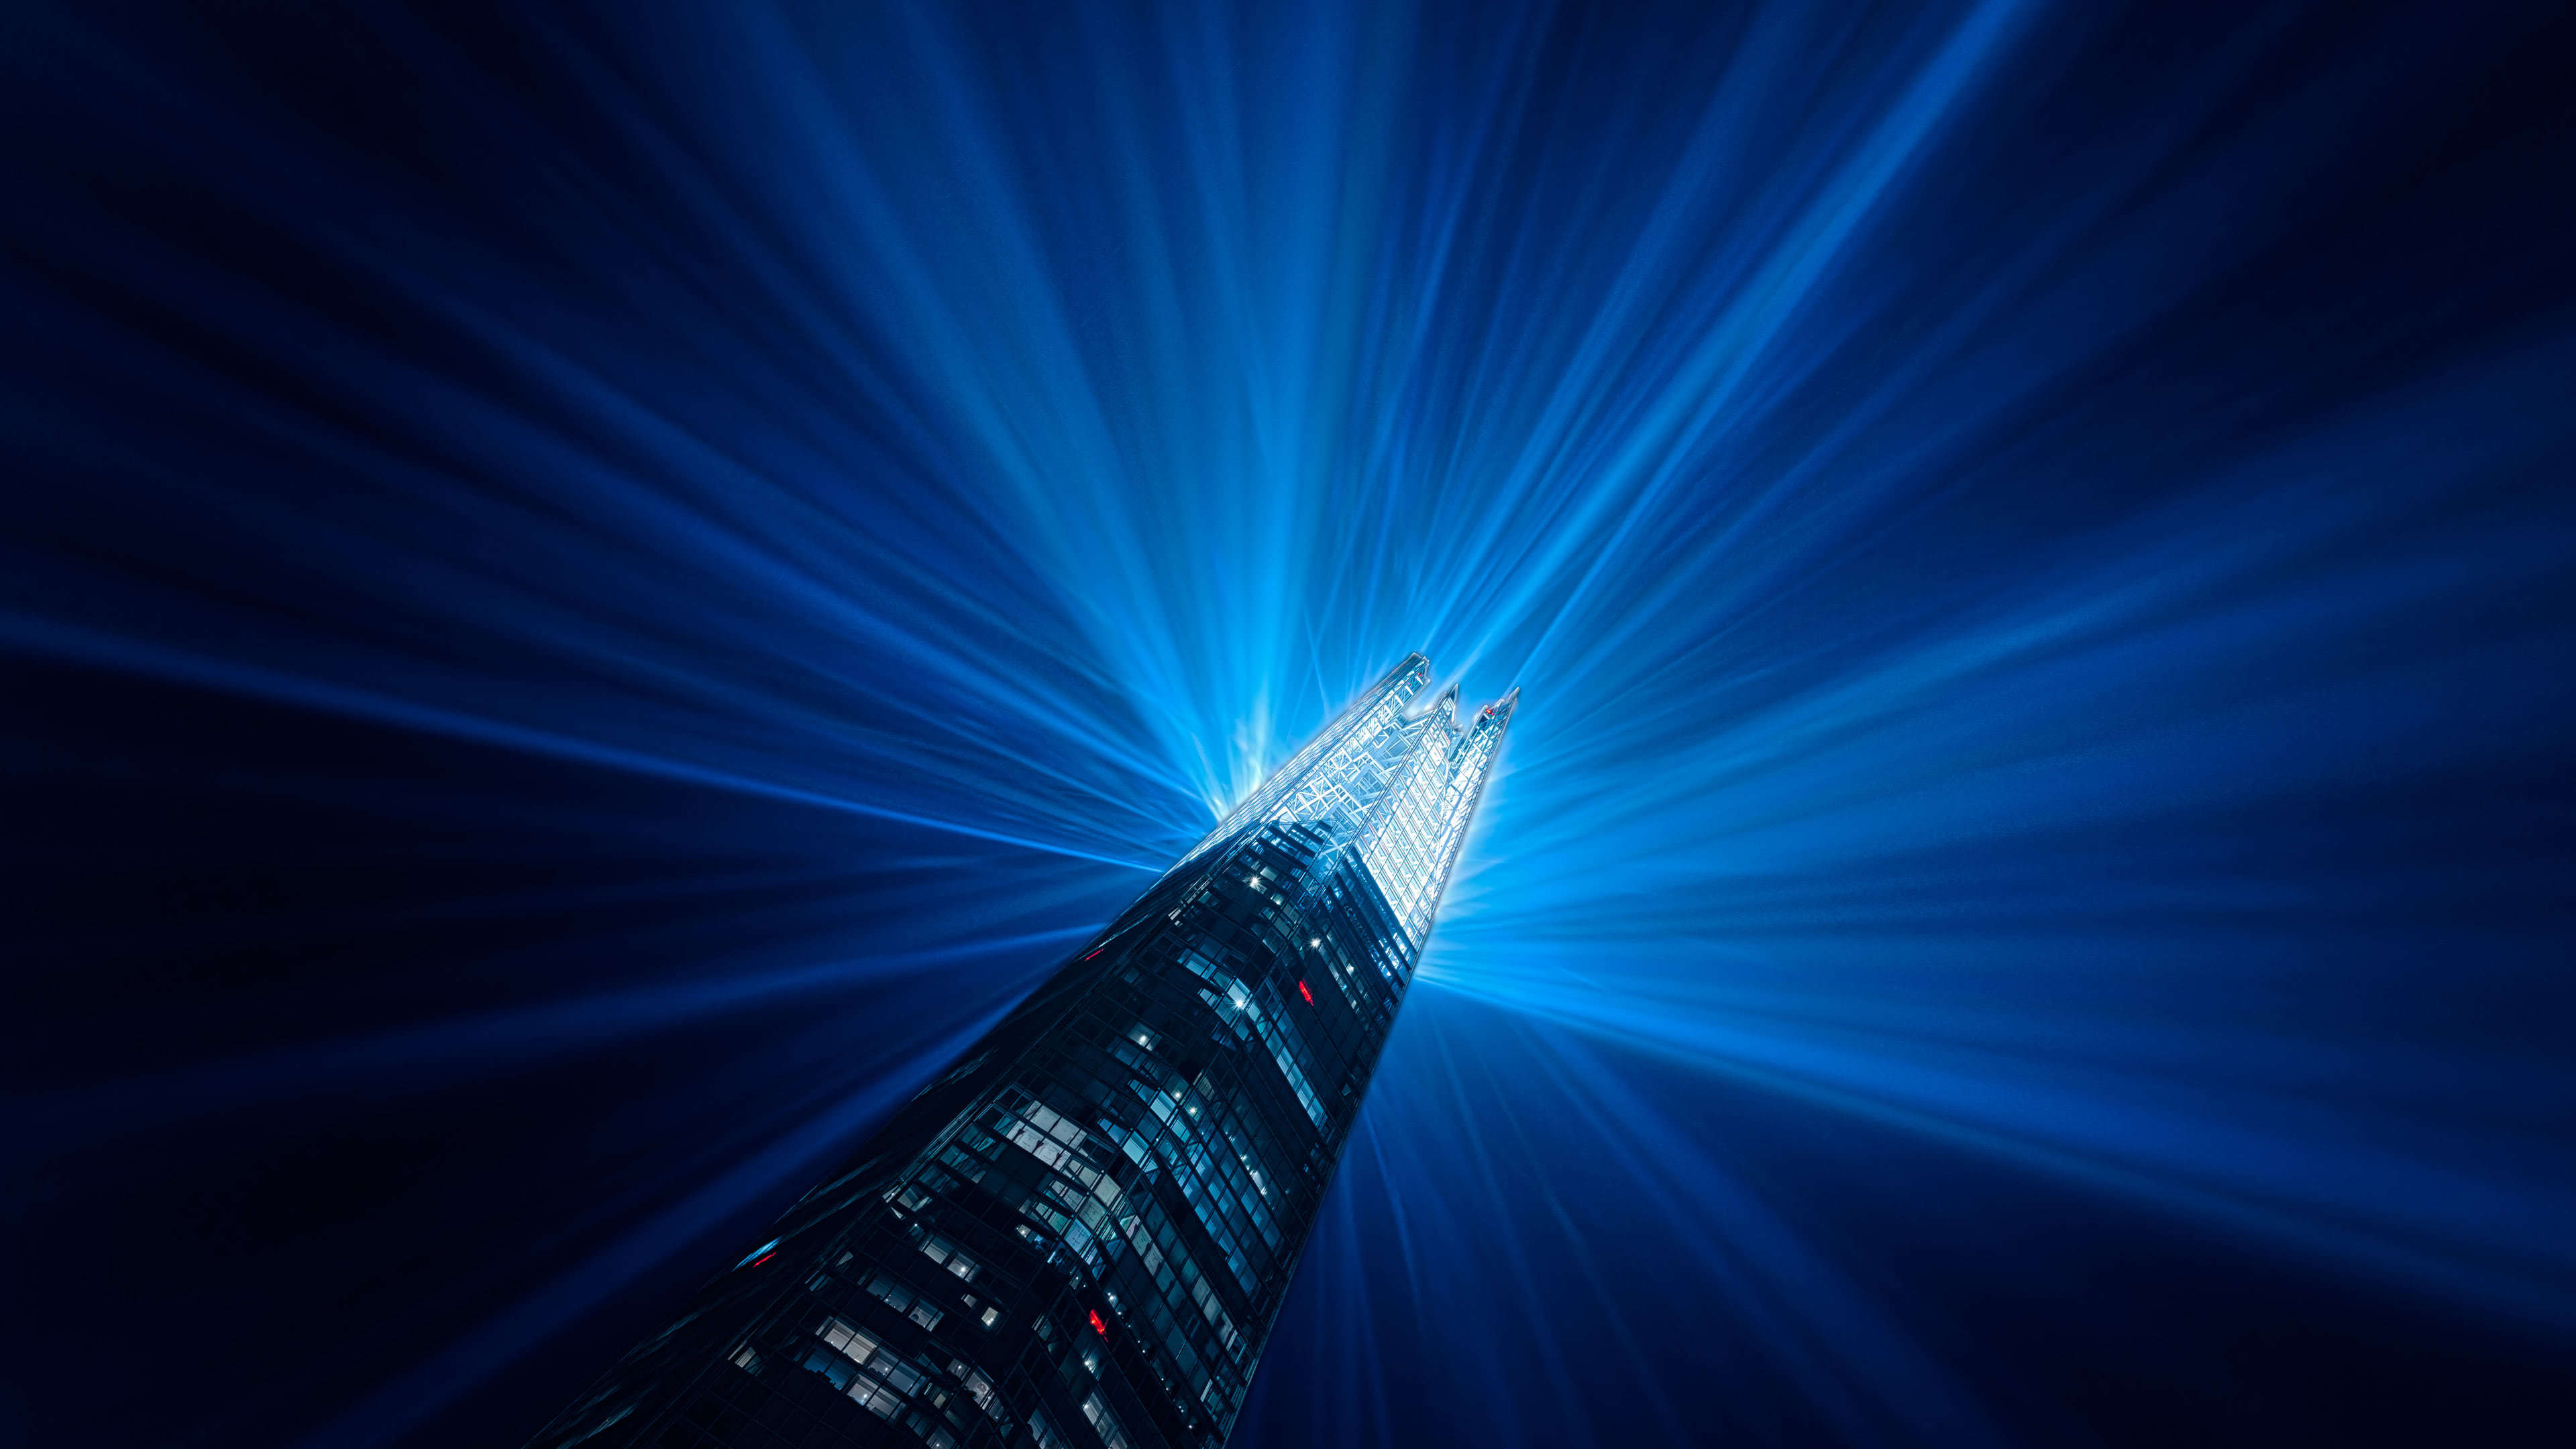 the shard new years eve light show london england uhd 4k wallpaper